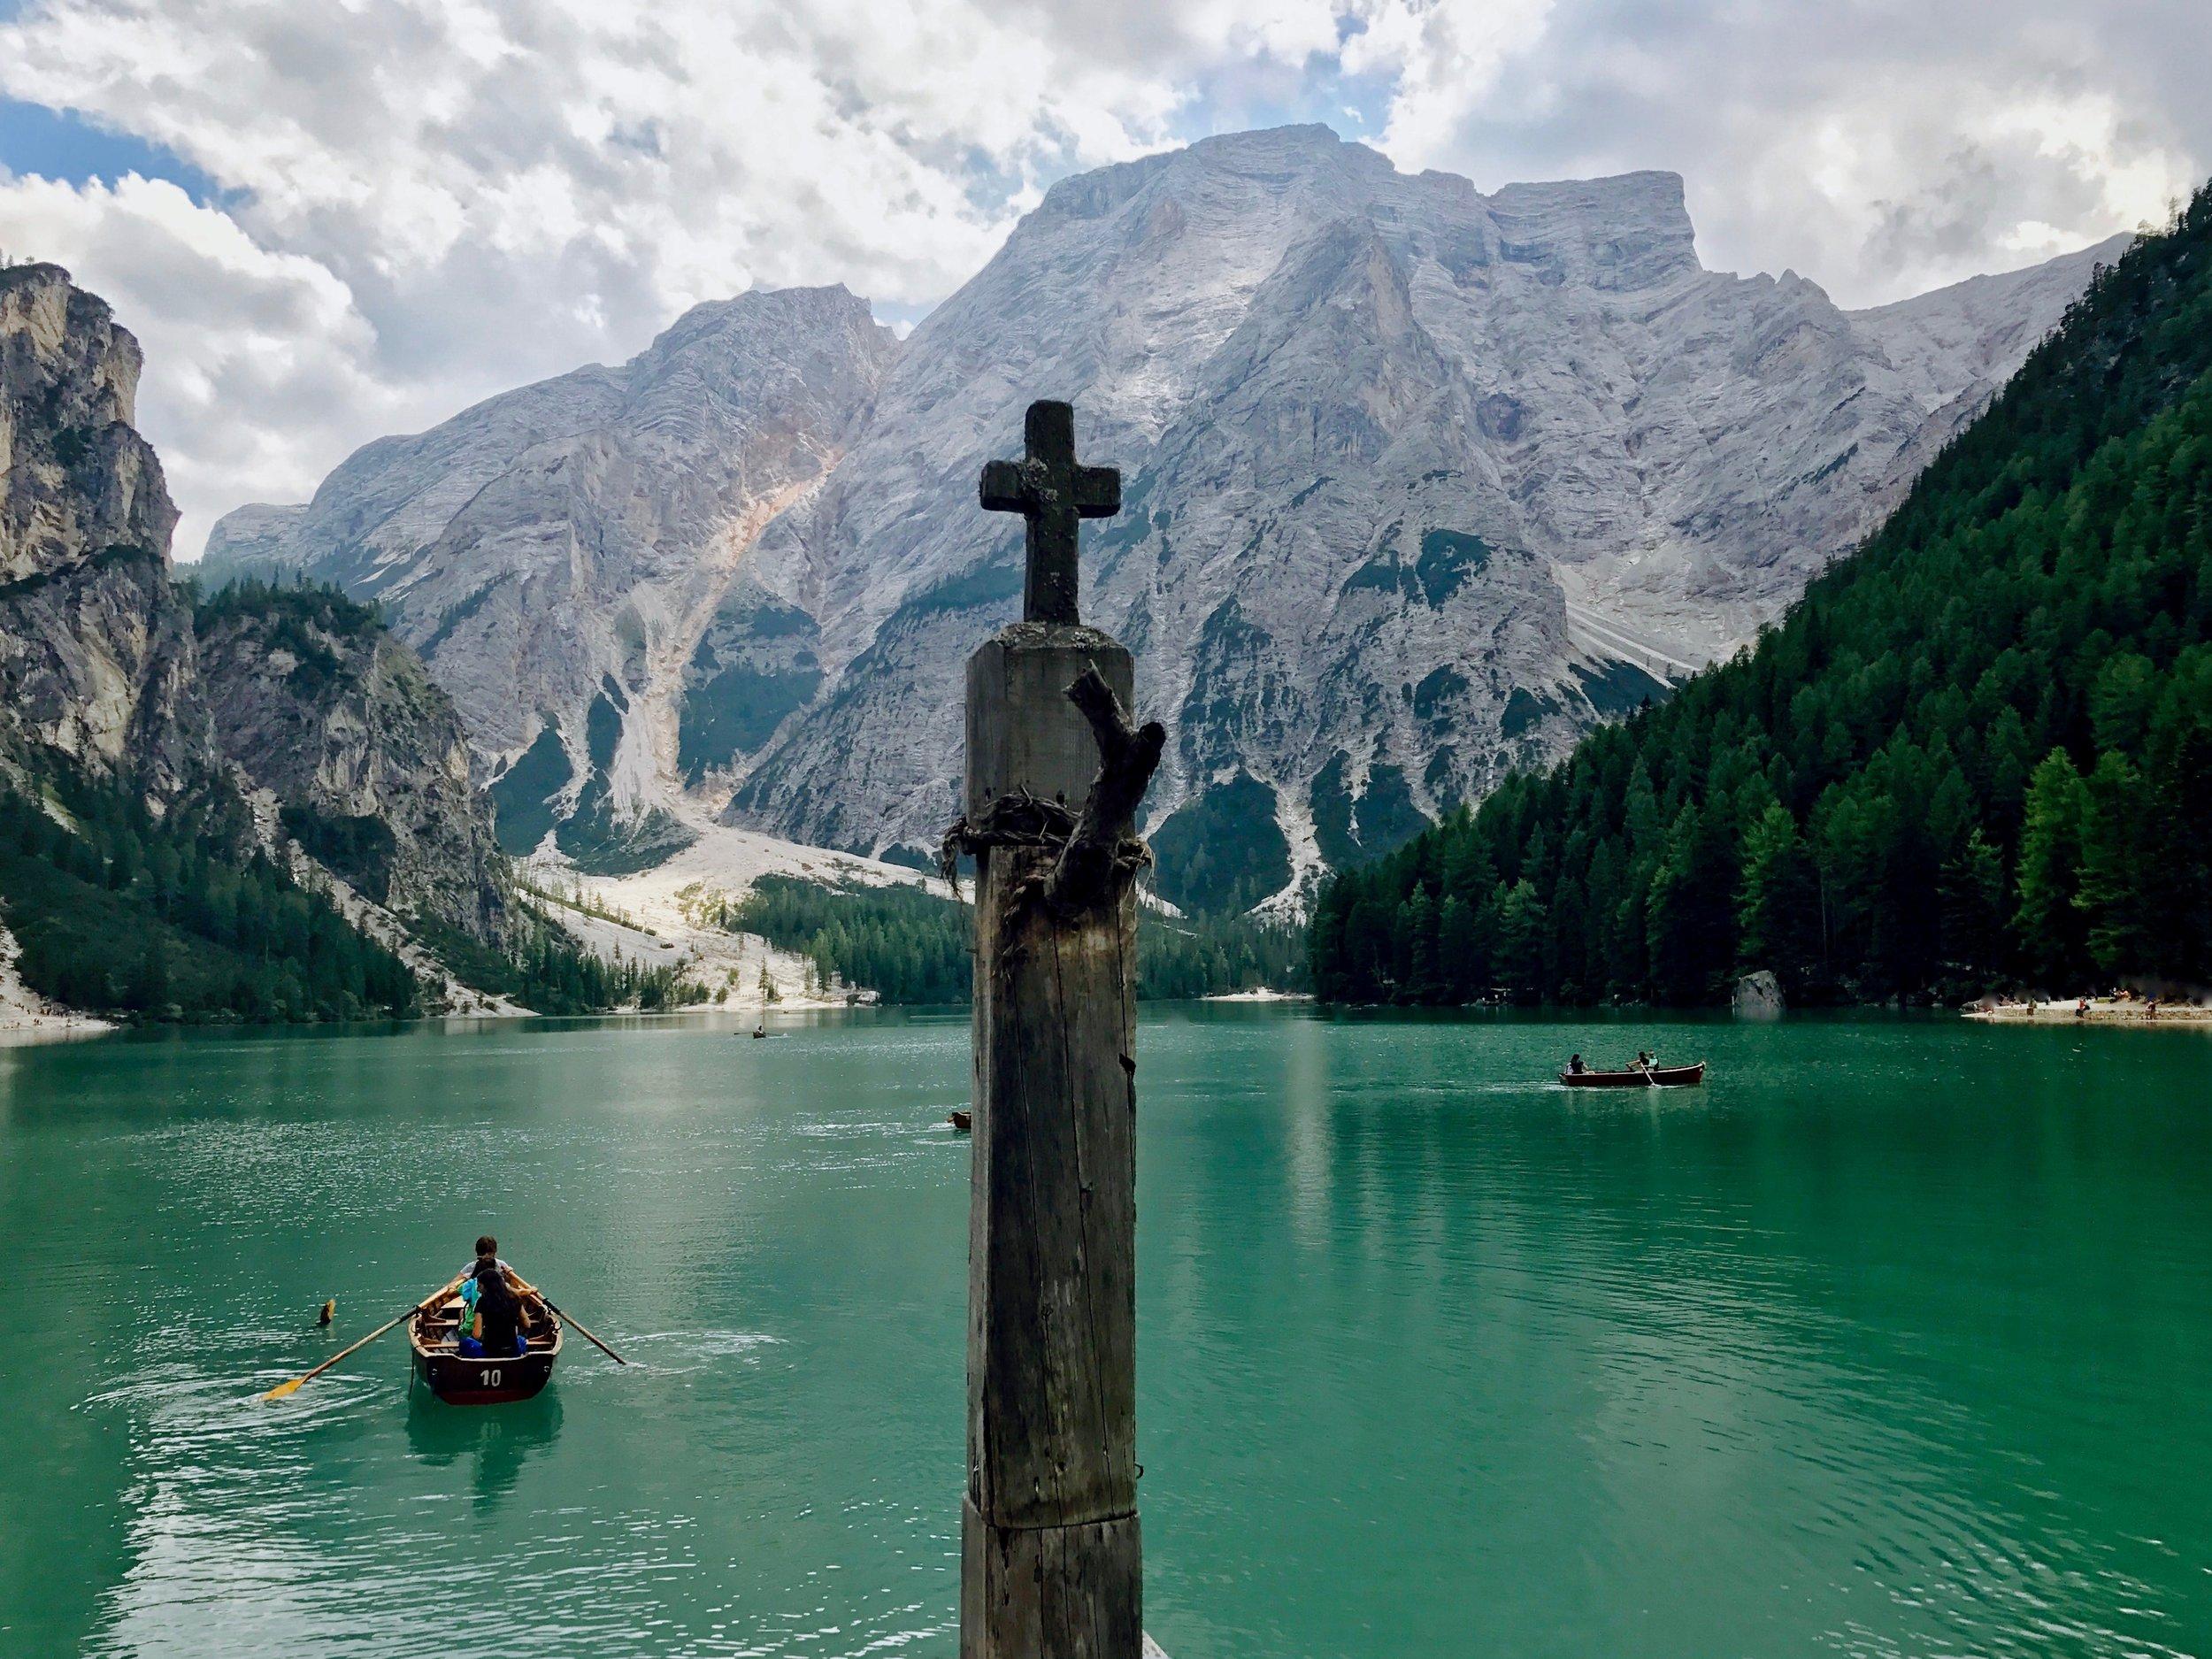 Lago di Braies, South Tyrol, Italy - 3 Days*